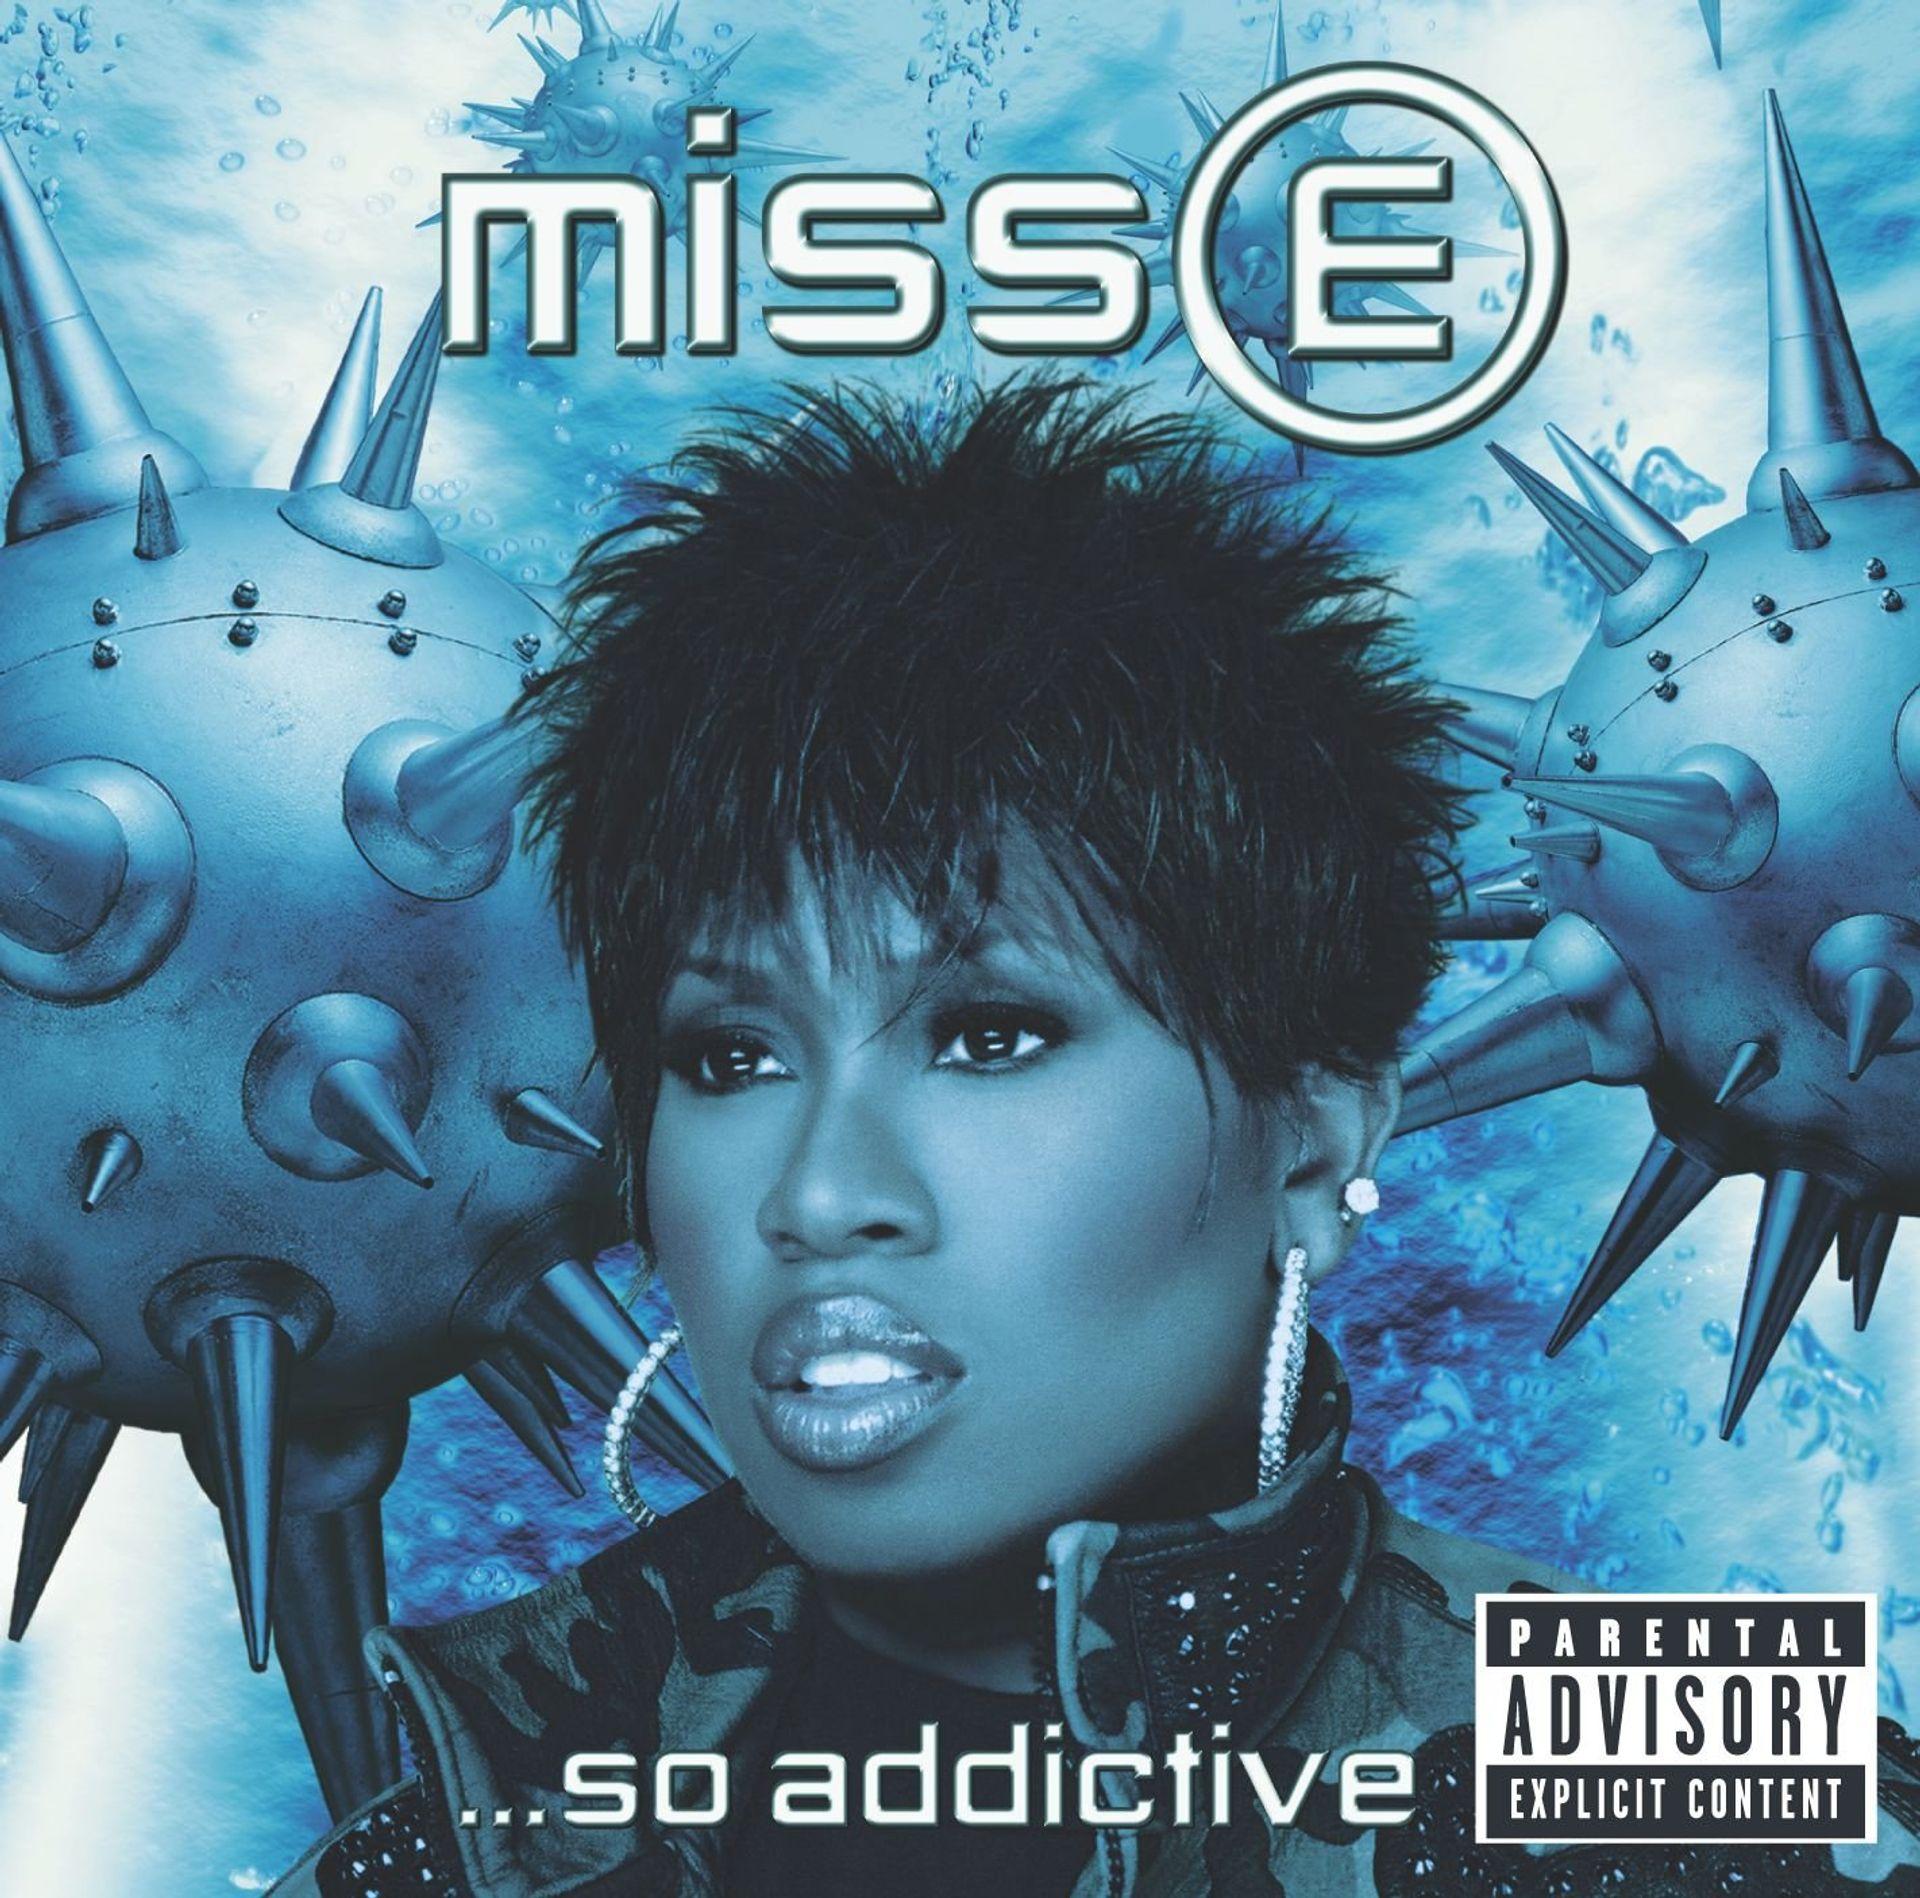 3voor12 Albumspecial: Missy Elliott - 'Miss E... So Addictive'